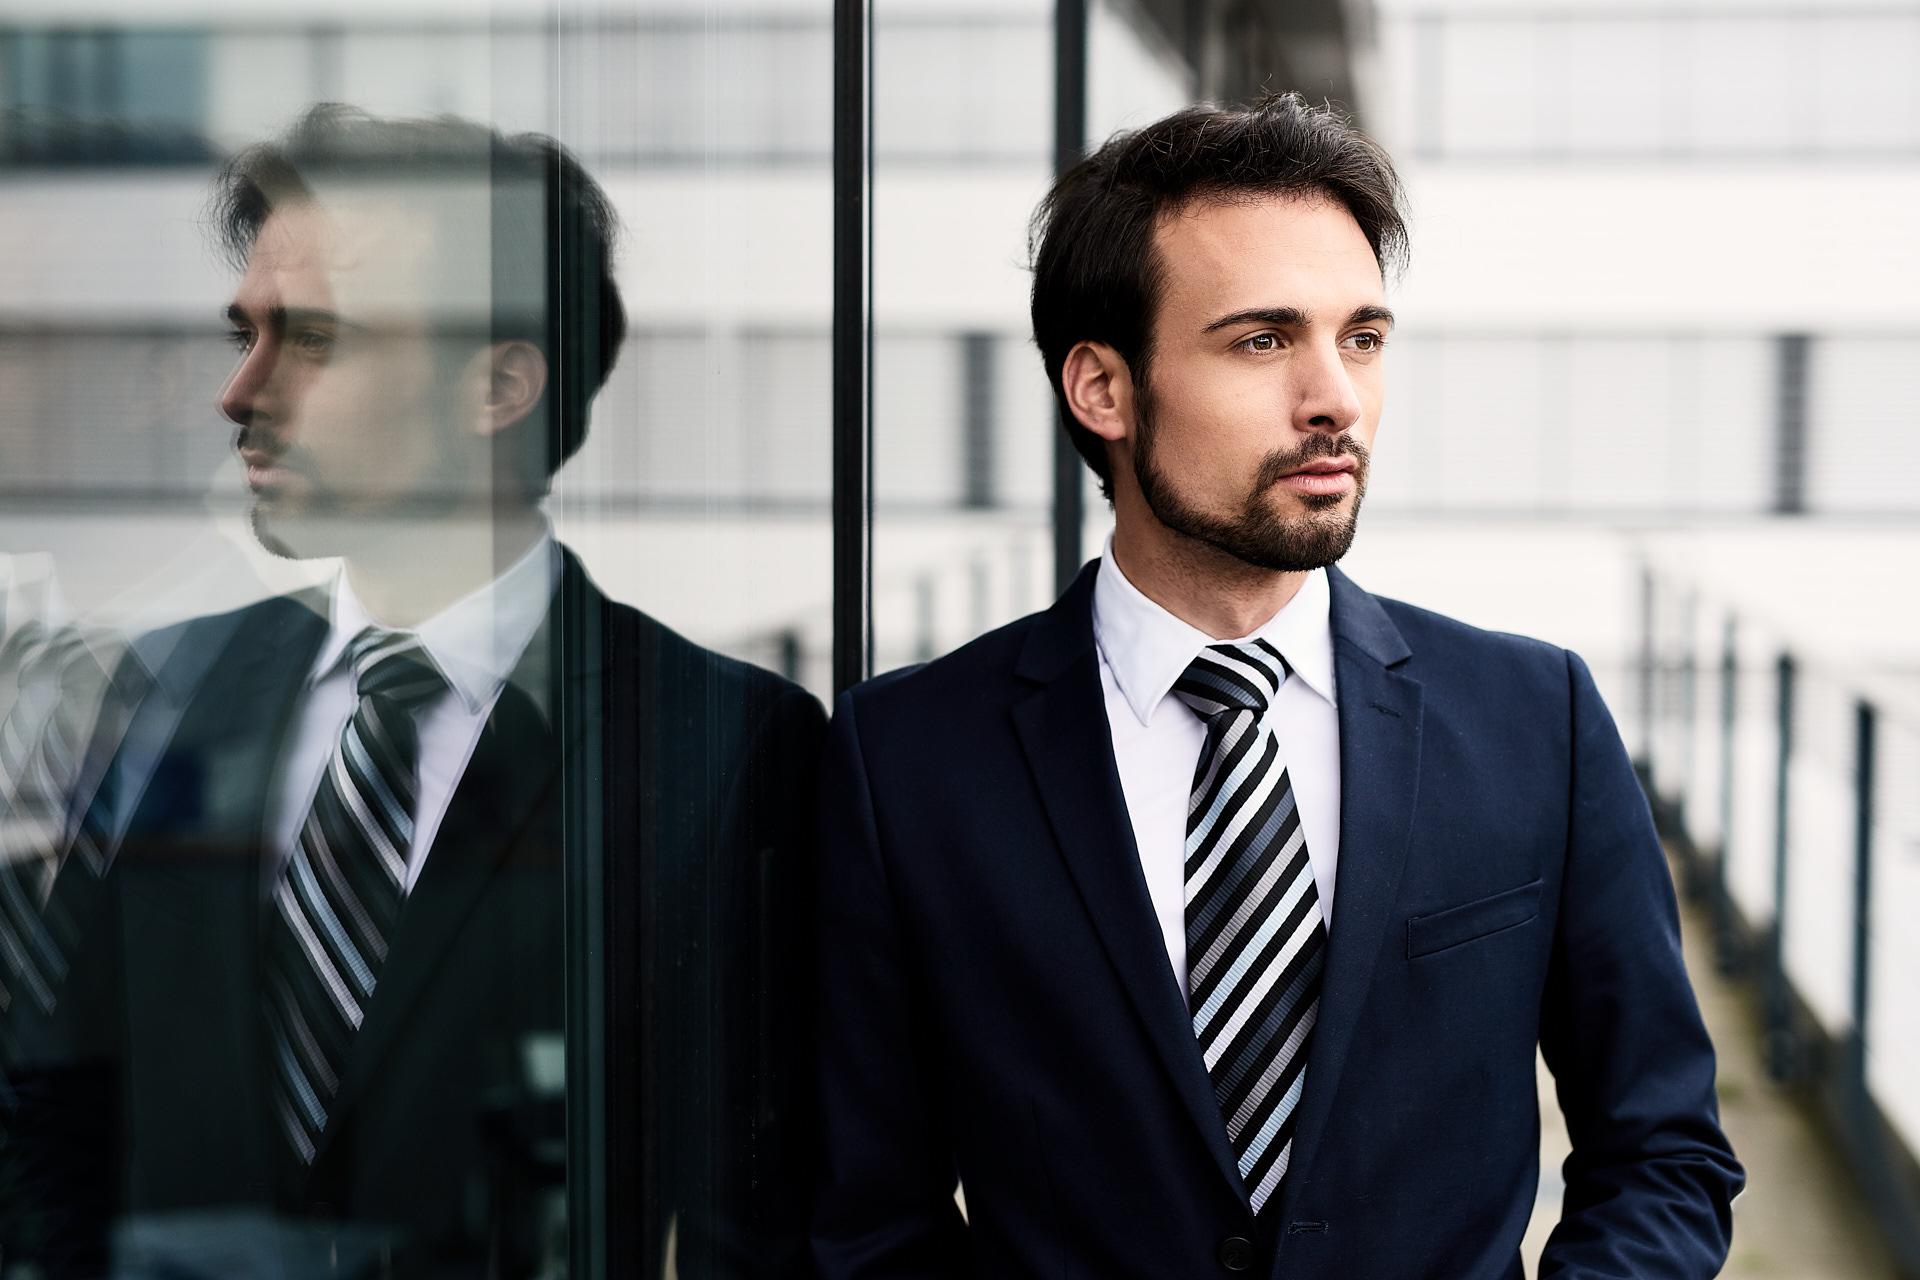 Business Portrait Markus01 by JHofer-Foto Juergen Hofer